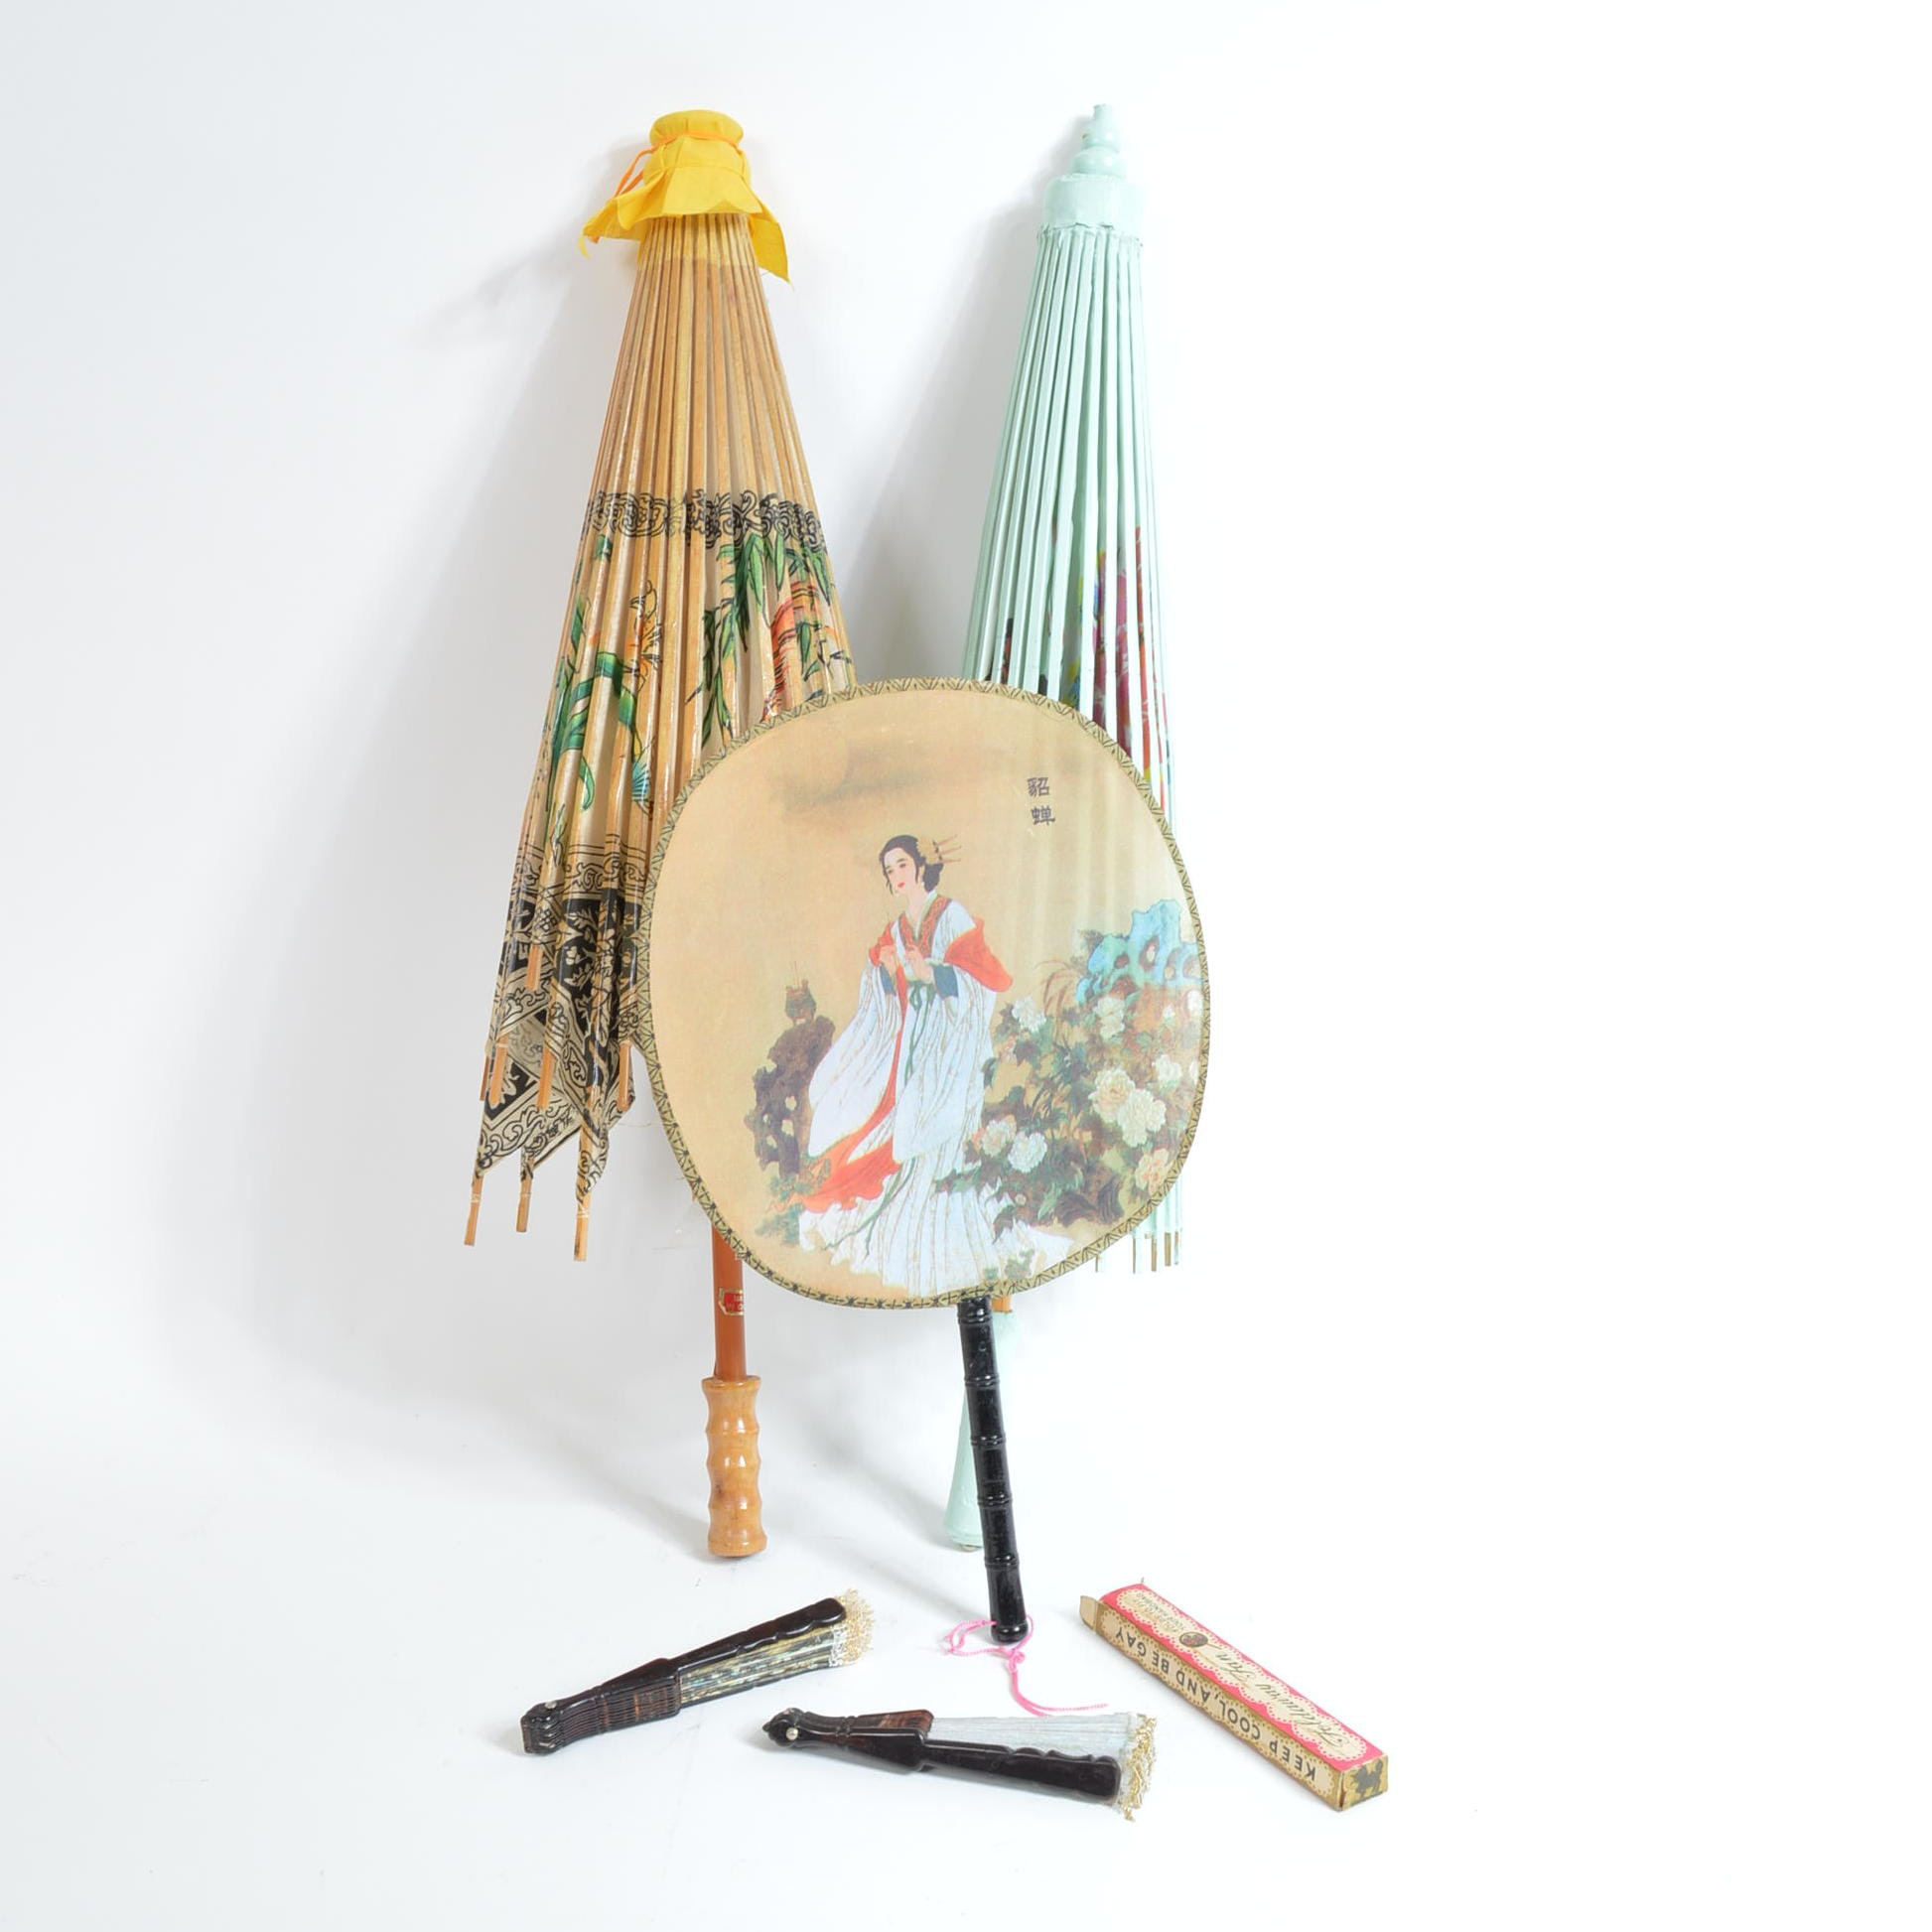 Assortment of Paper Parasols and Fans